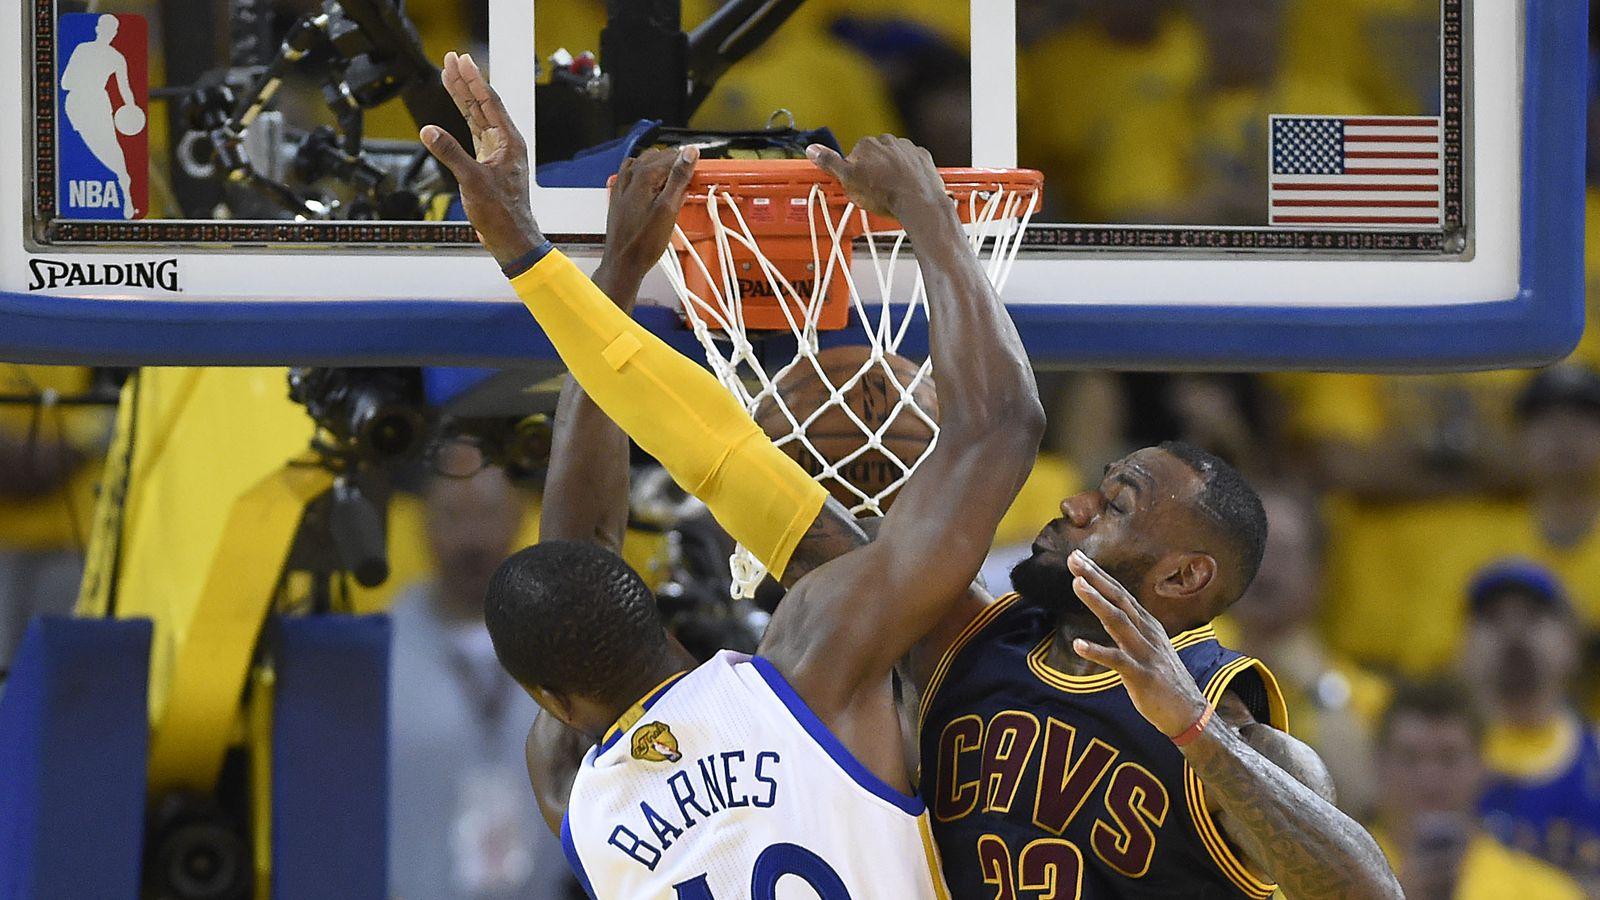 Harrison Barnes uses #TBT to remind everyone he dunked on LeBron James - SBNation.com